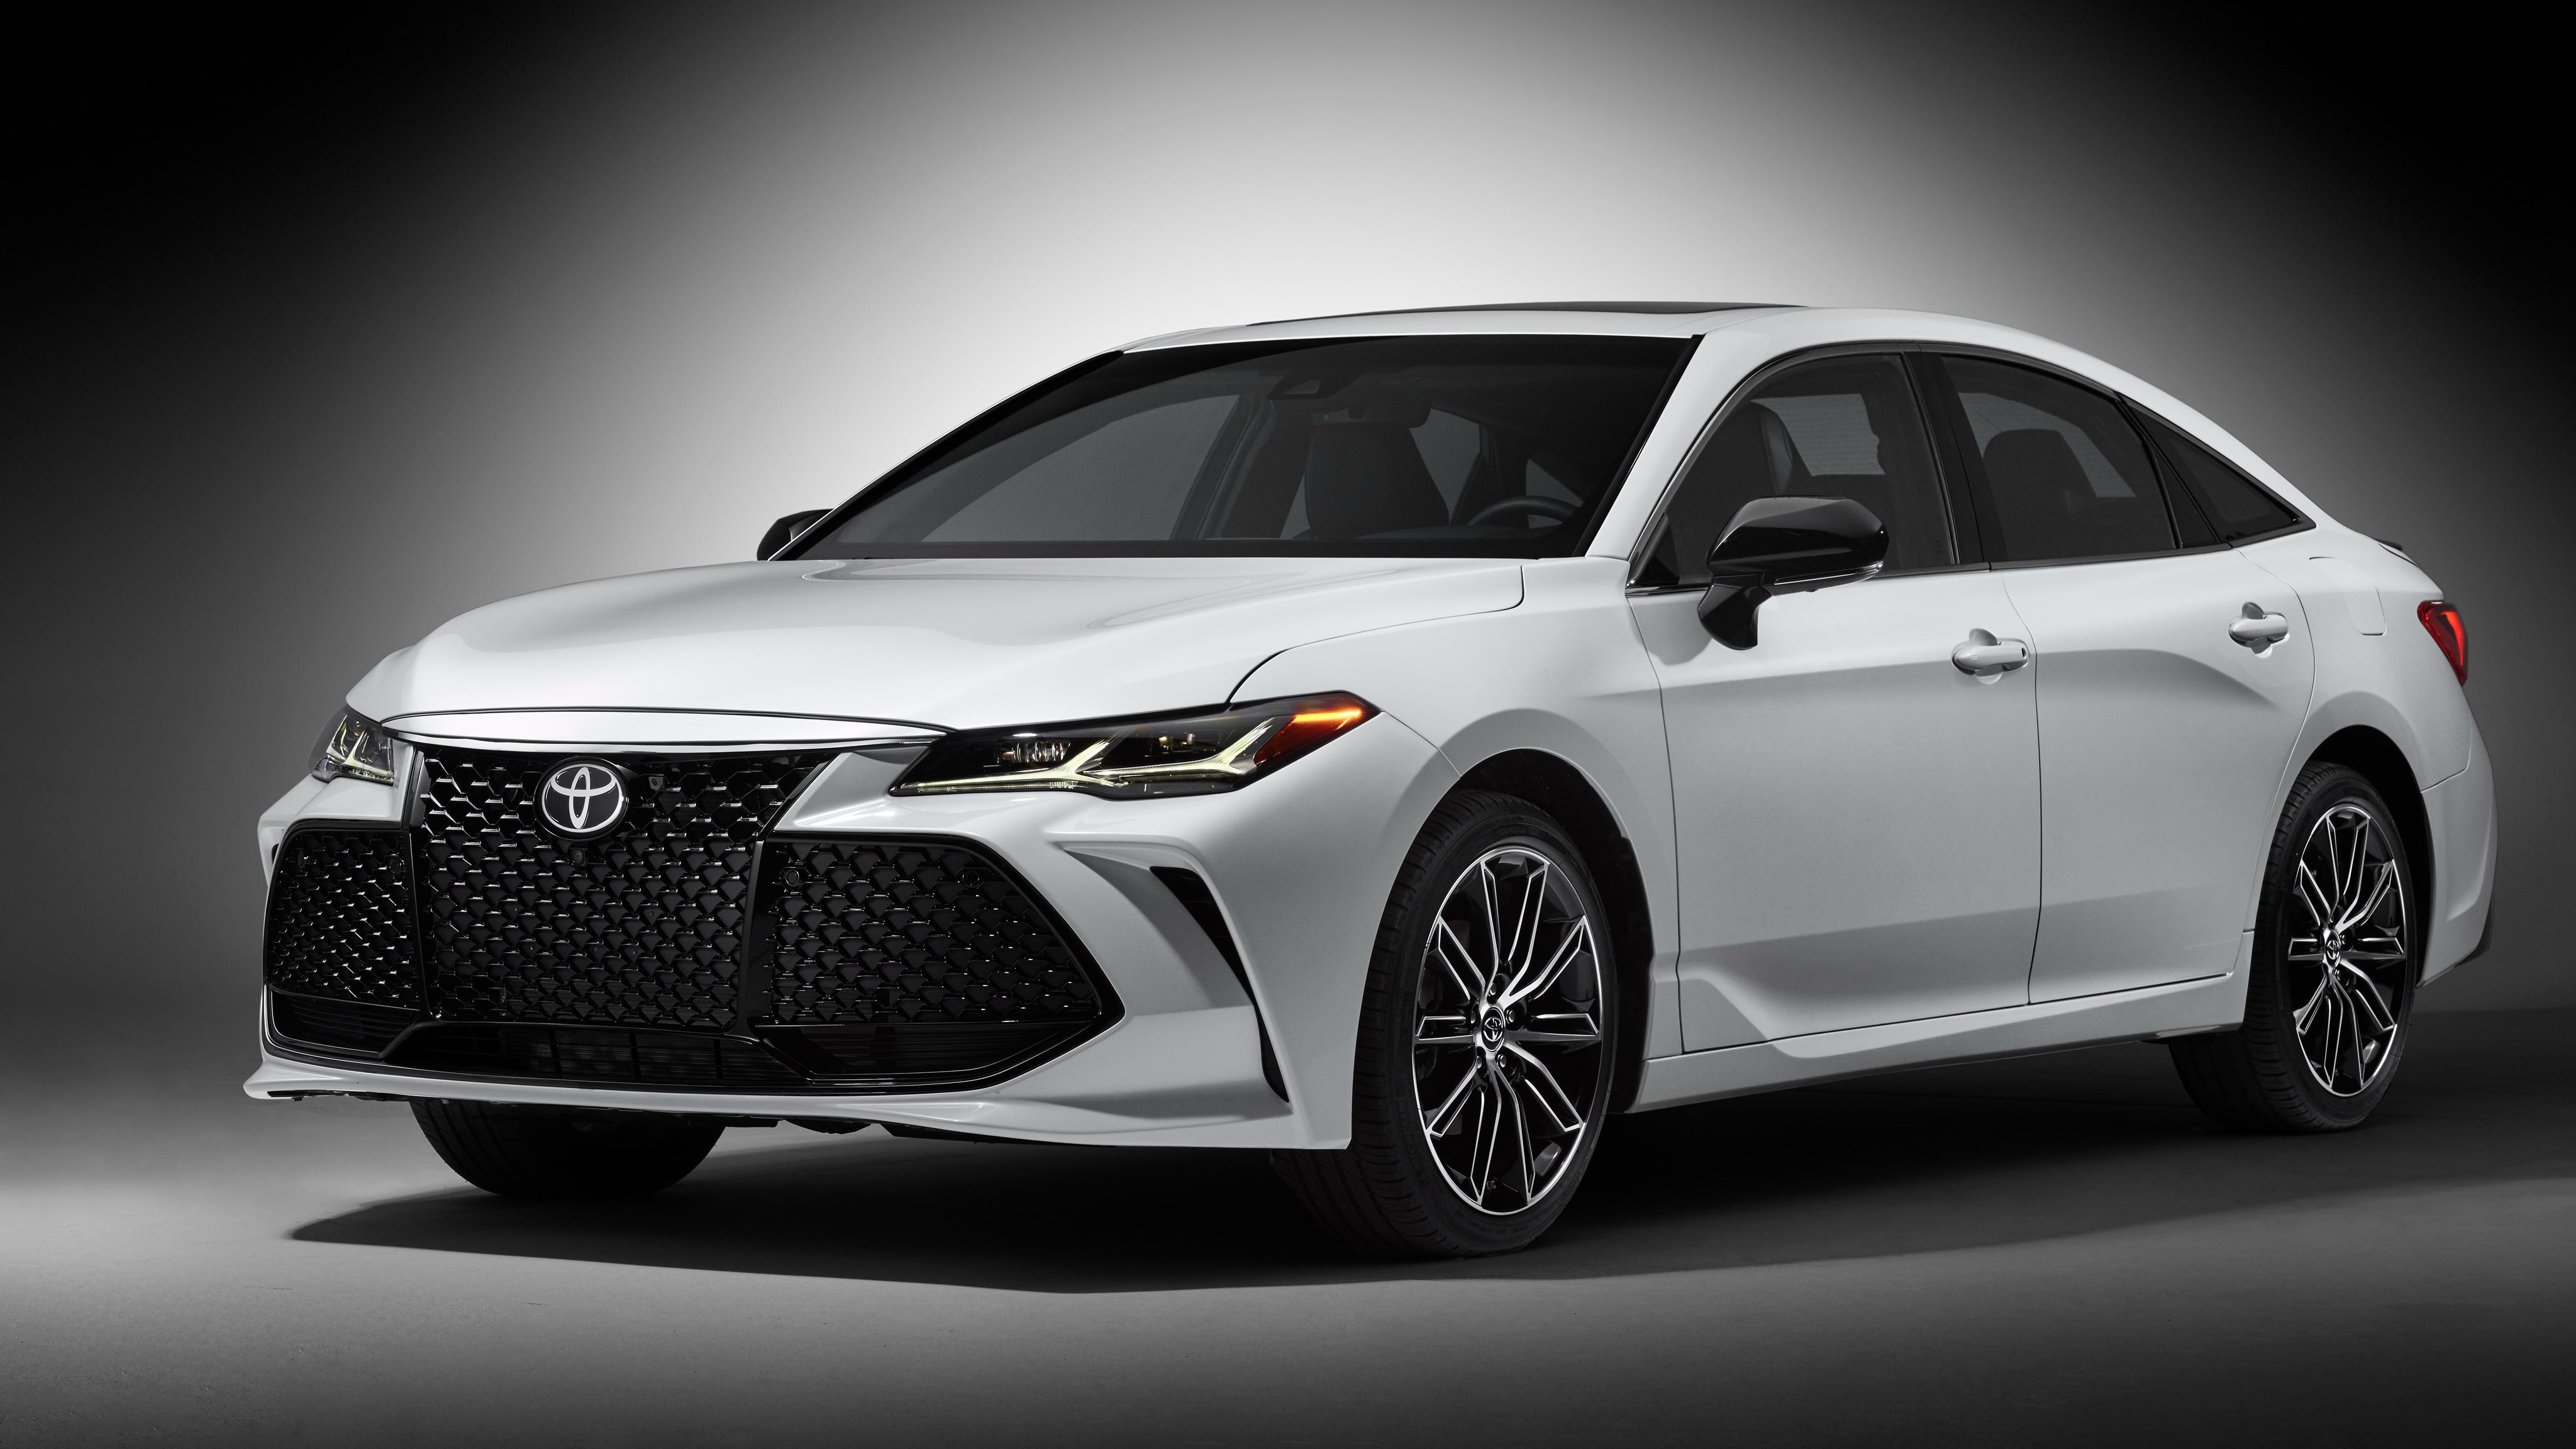 2019 Toyota Avalon Touring 4k Wallpaper Hd Car